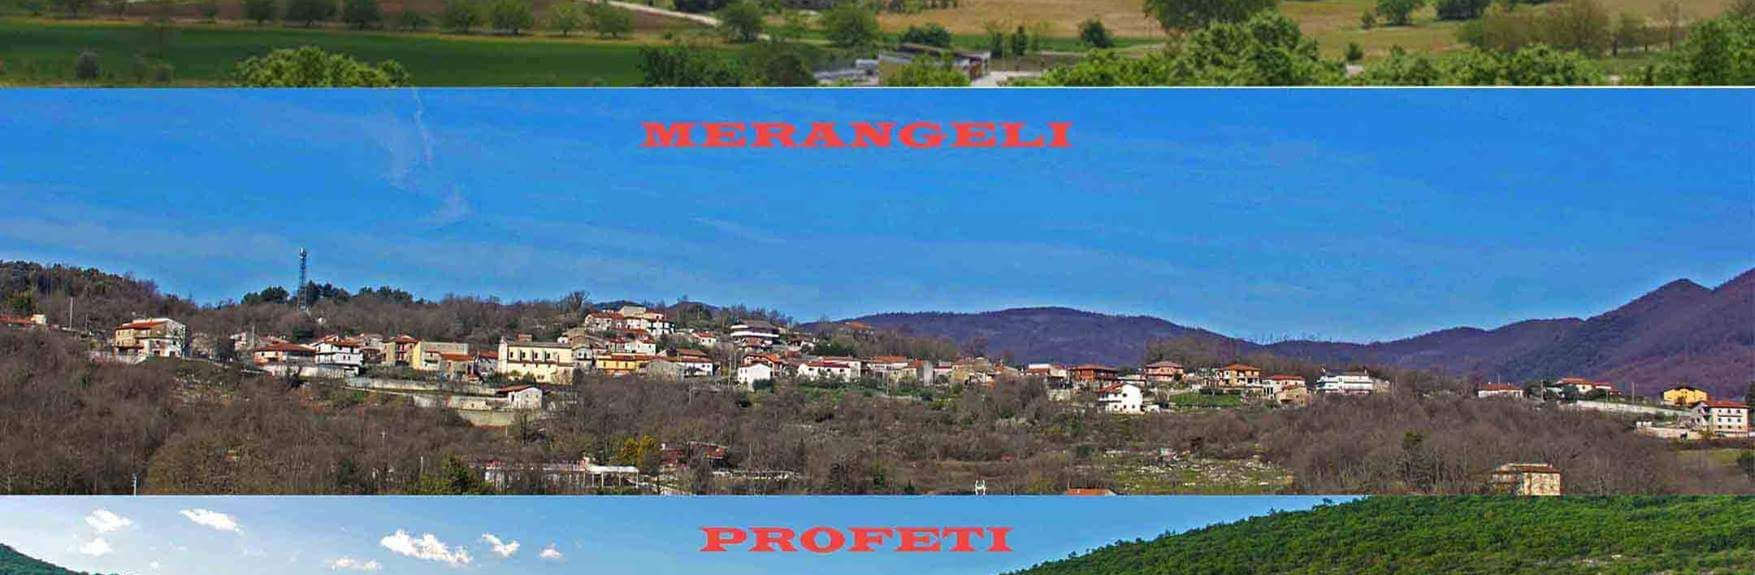 Capua, Καμπανία, Ιταλία